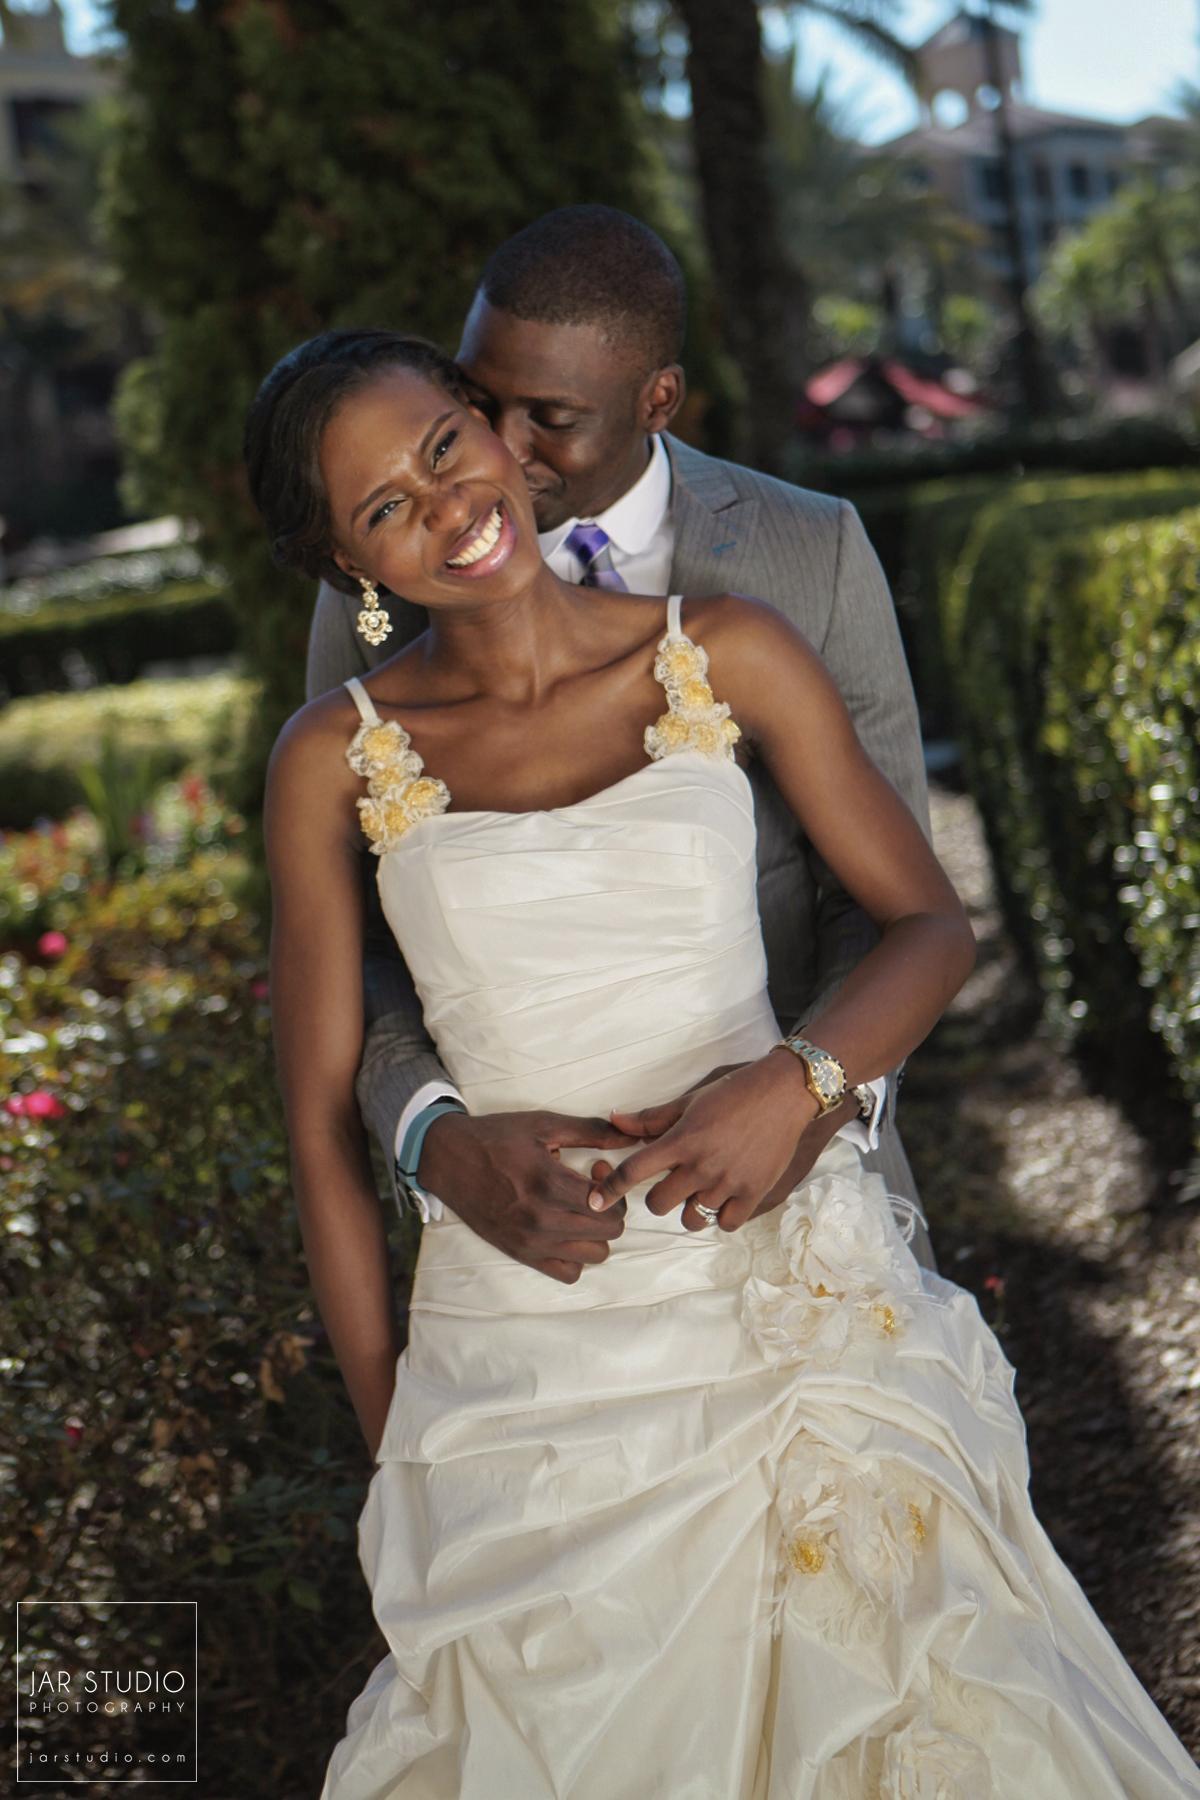 27-destination-disney-bridal-portraits-wedding-photographer-jaime.JPG